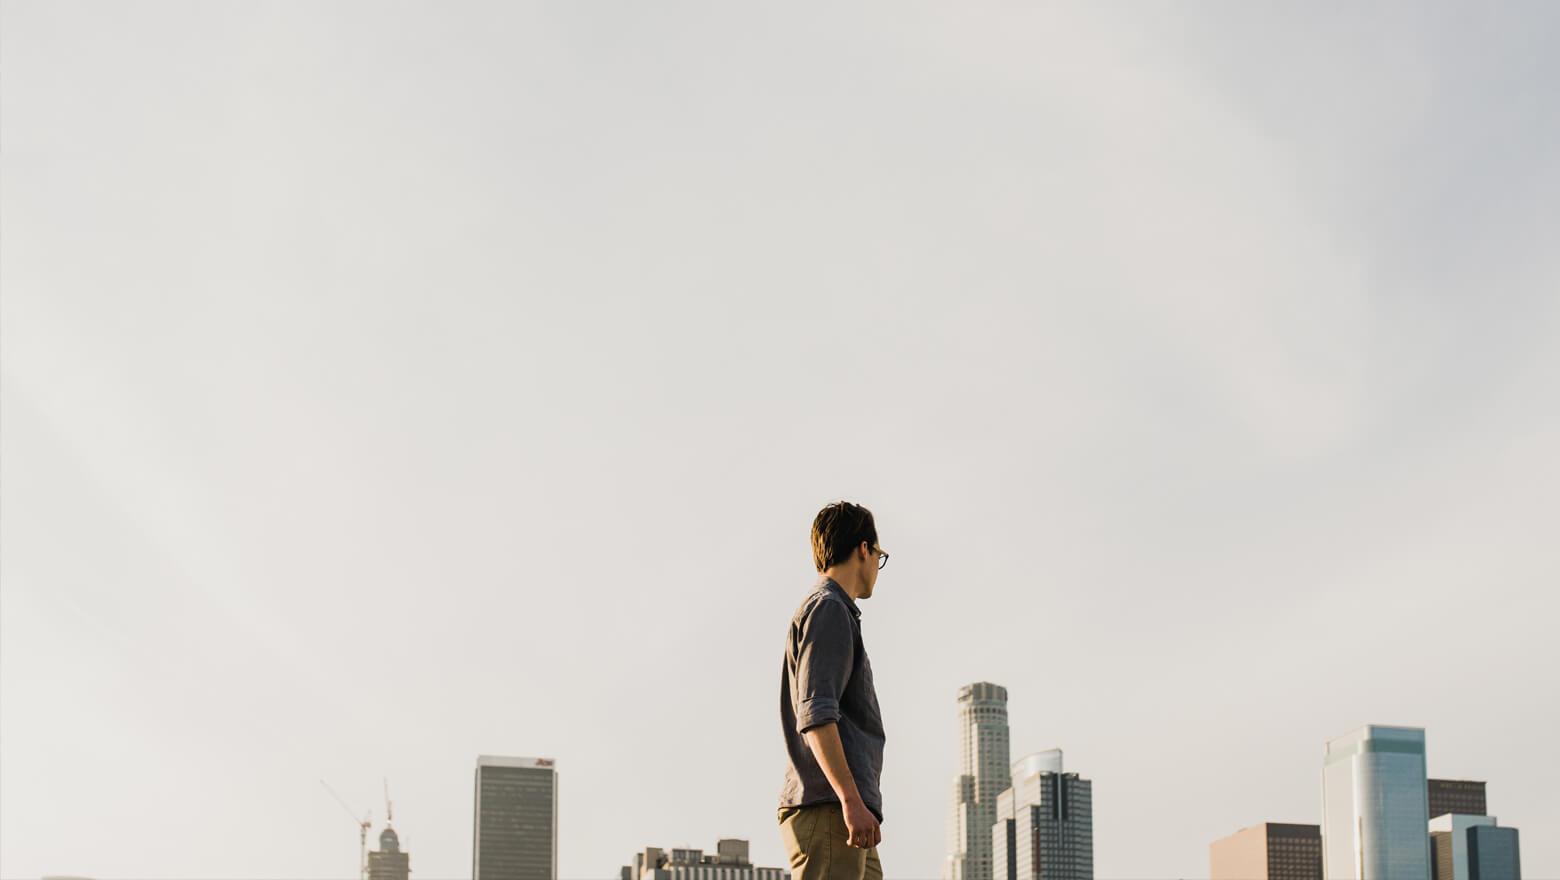 Man looking toward city